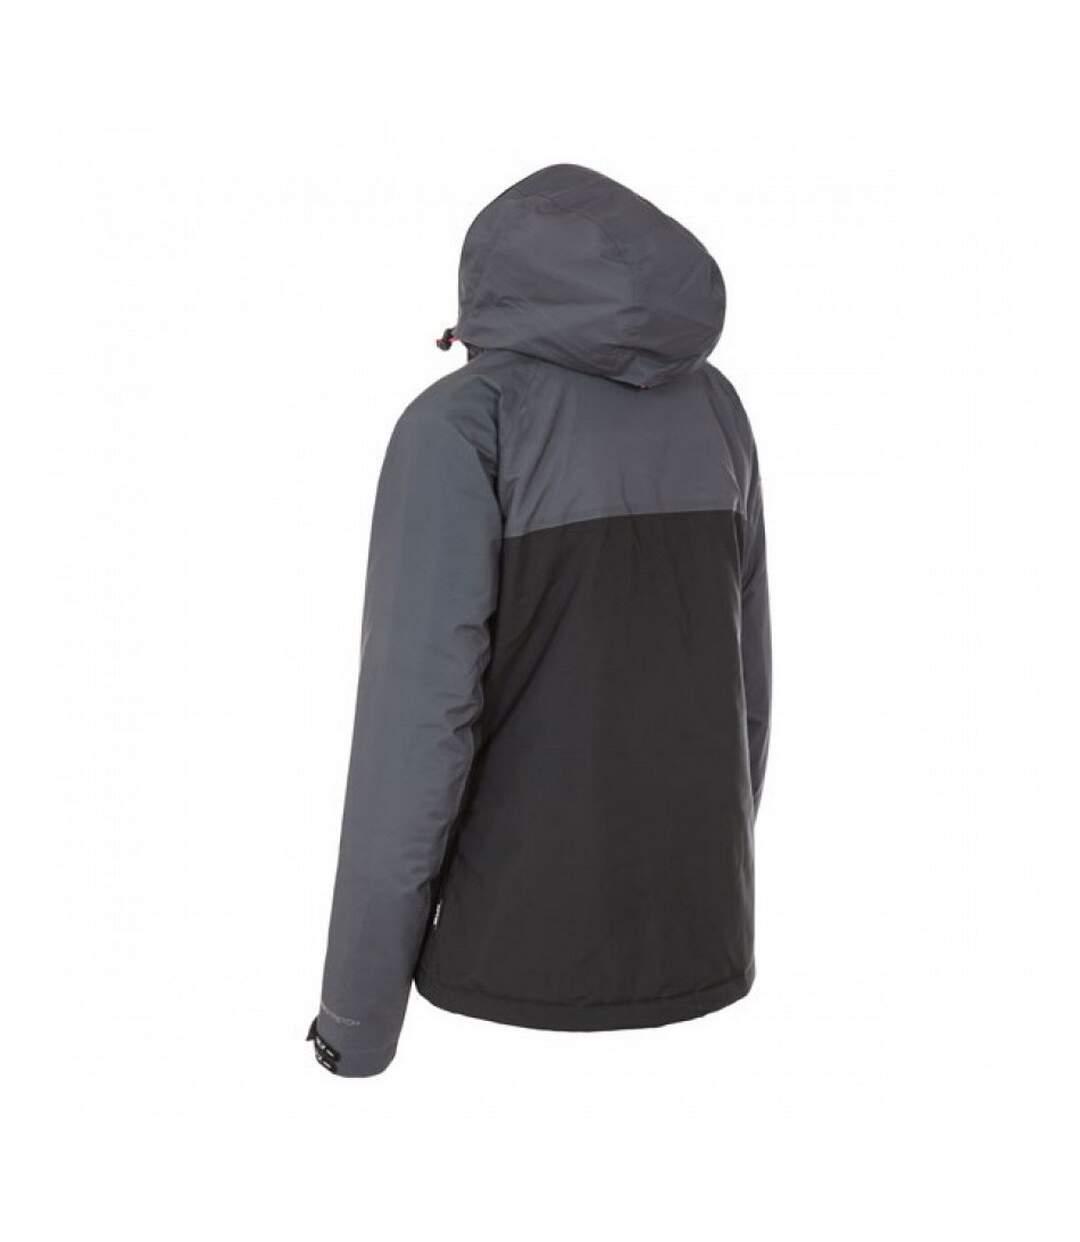 Trespass Womens/Ladies Crista Waterproof DLX Ski Jacket (Black) - UTTP3631